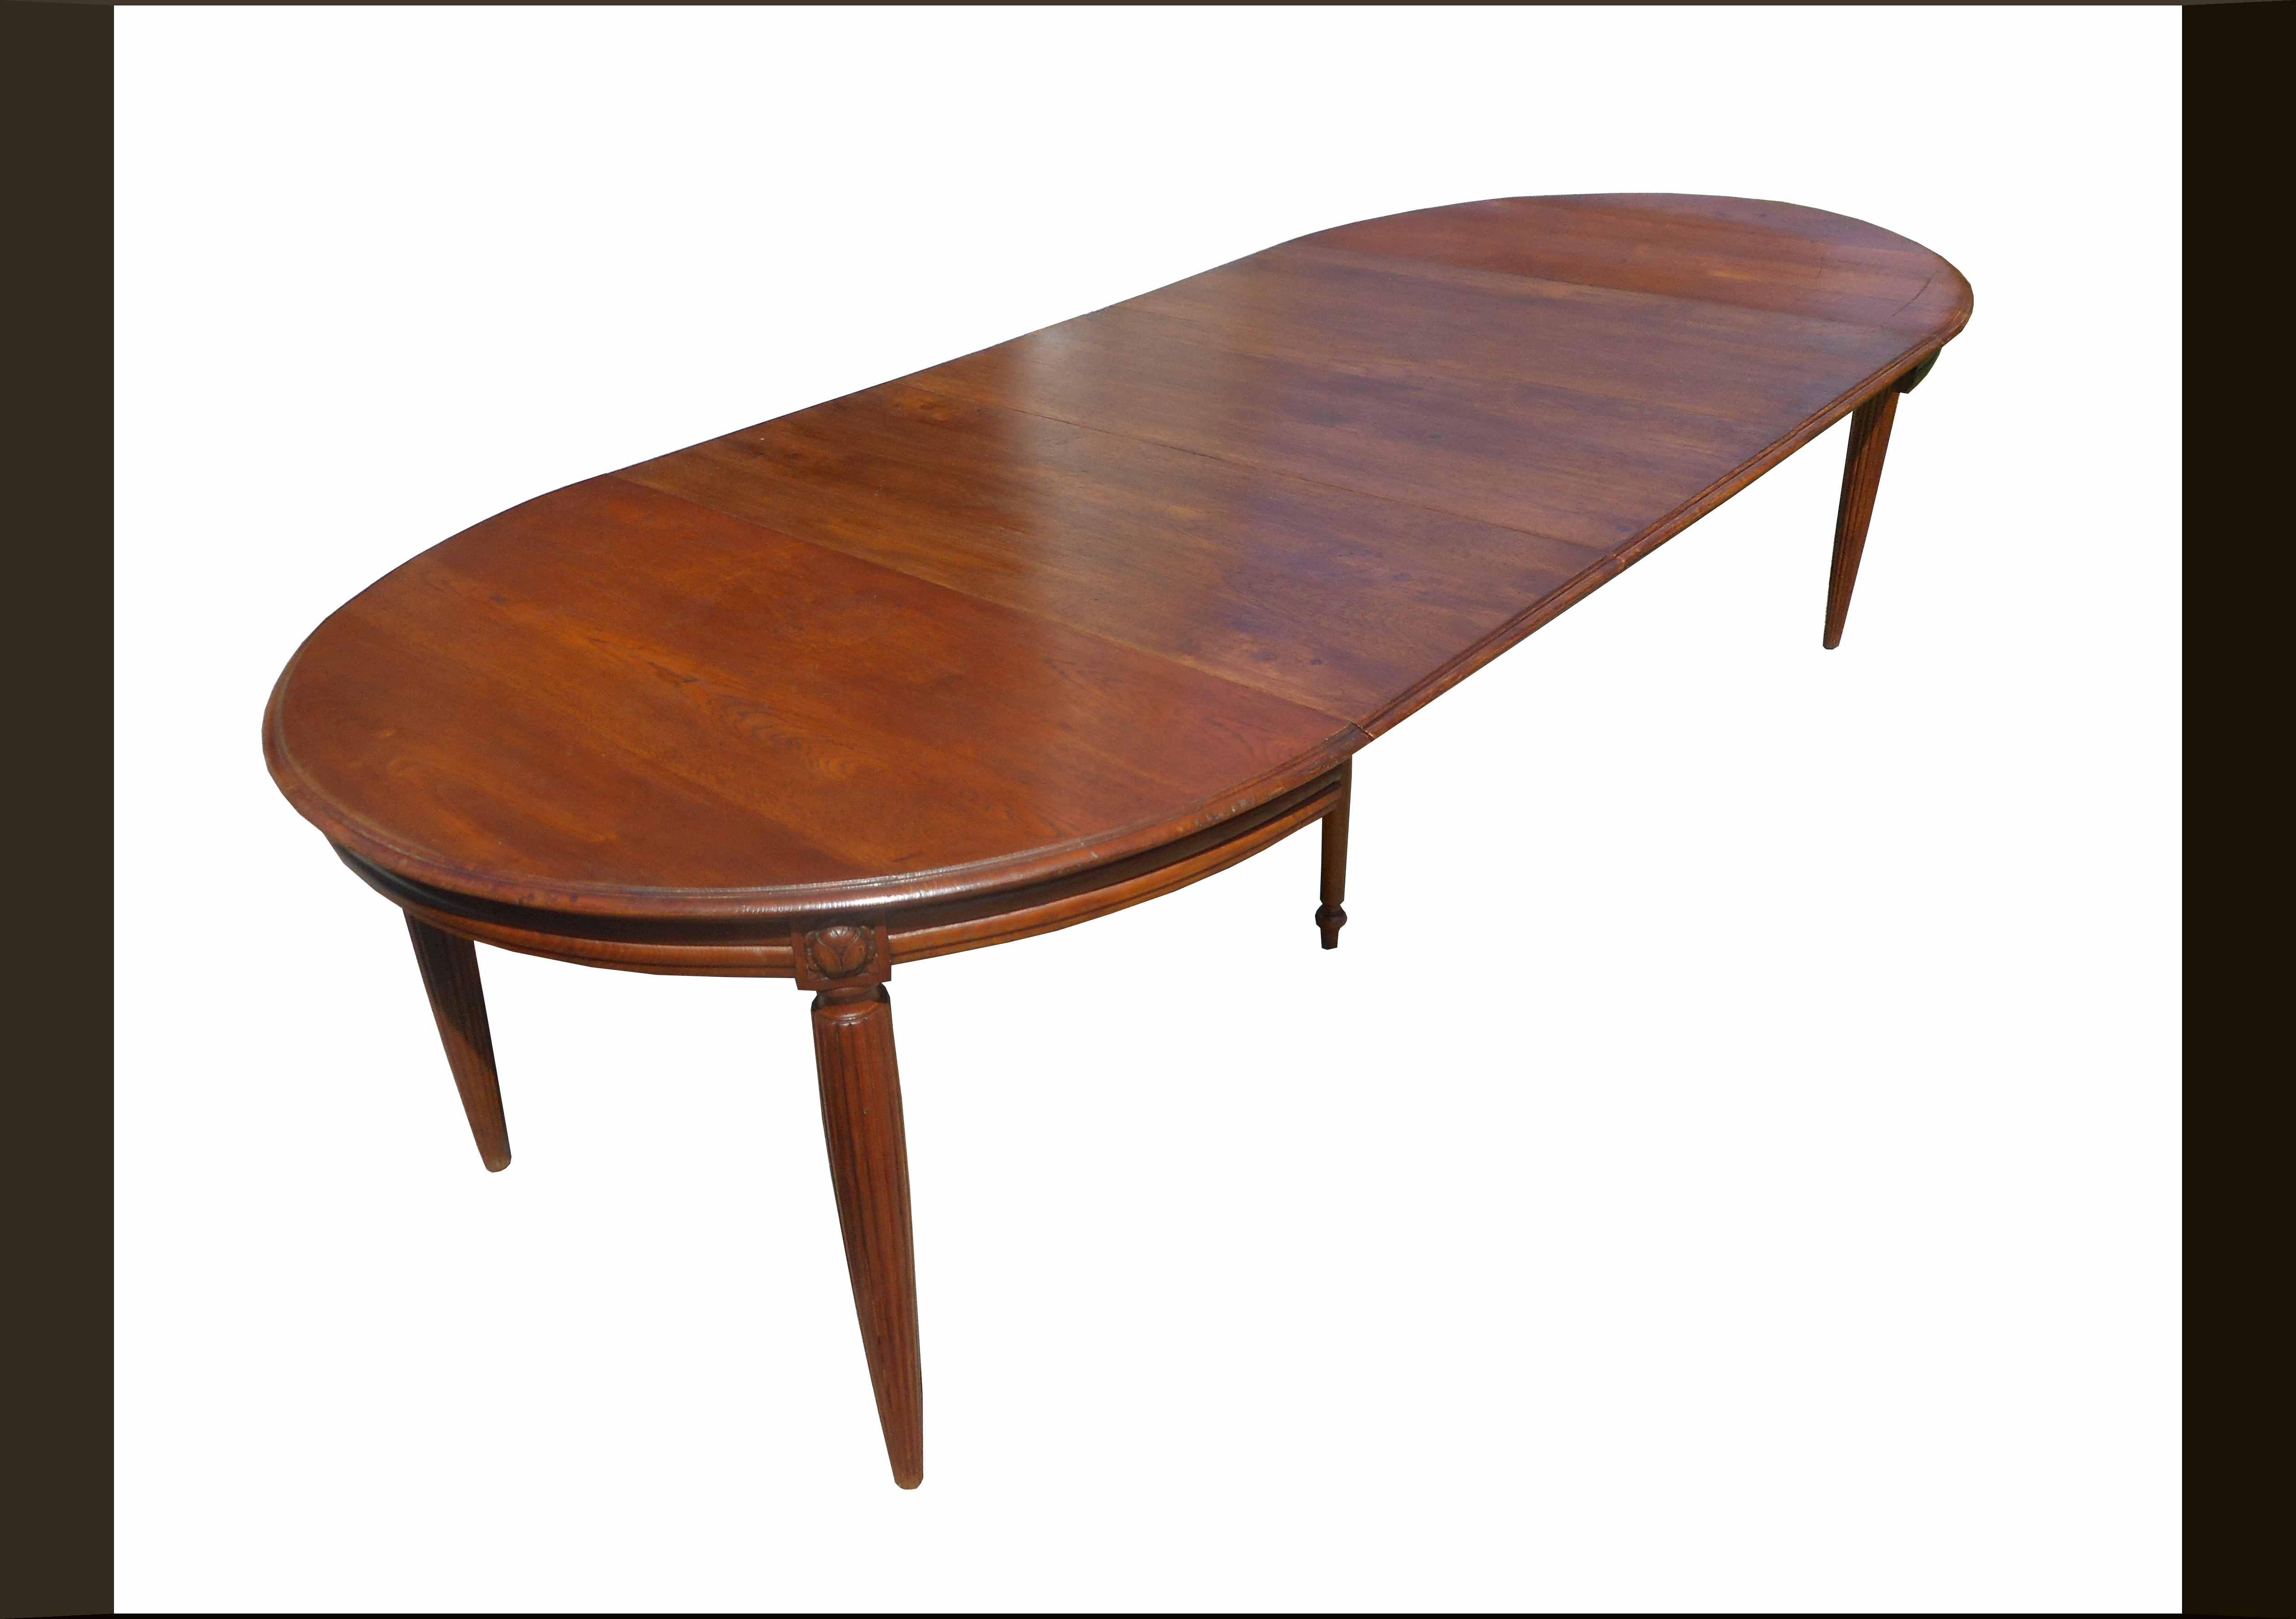 Tavolo ovale allungabile restaurato